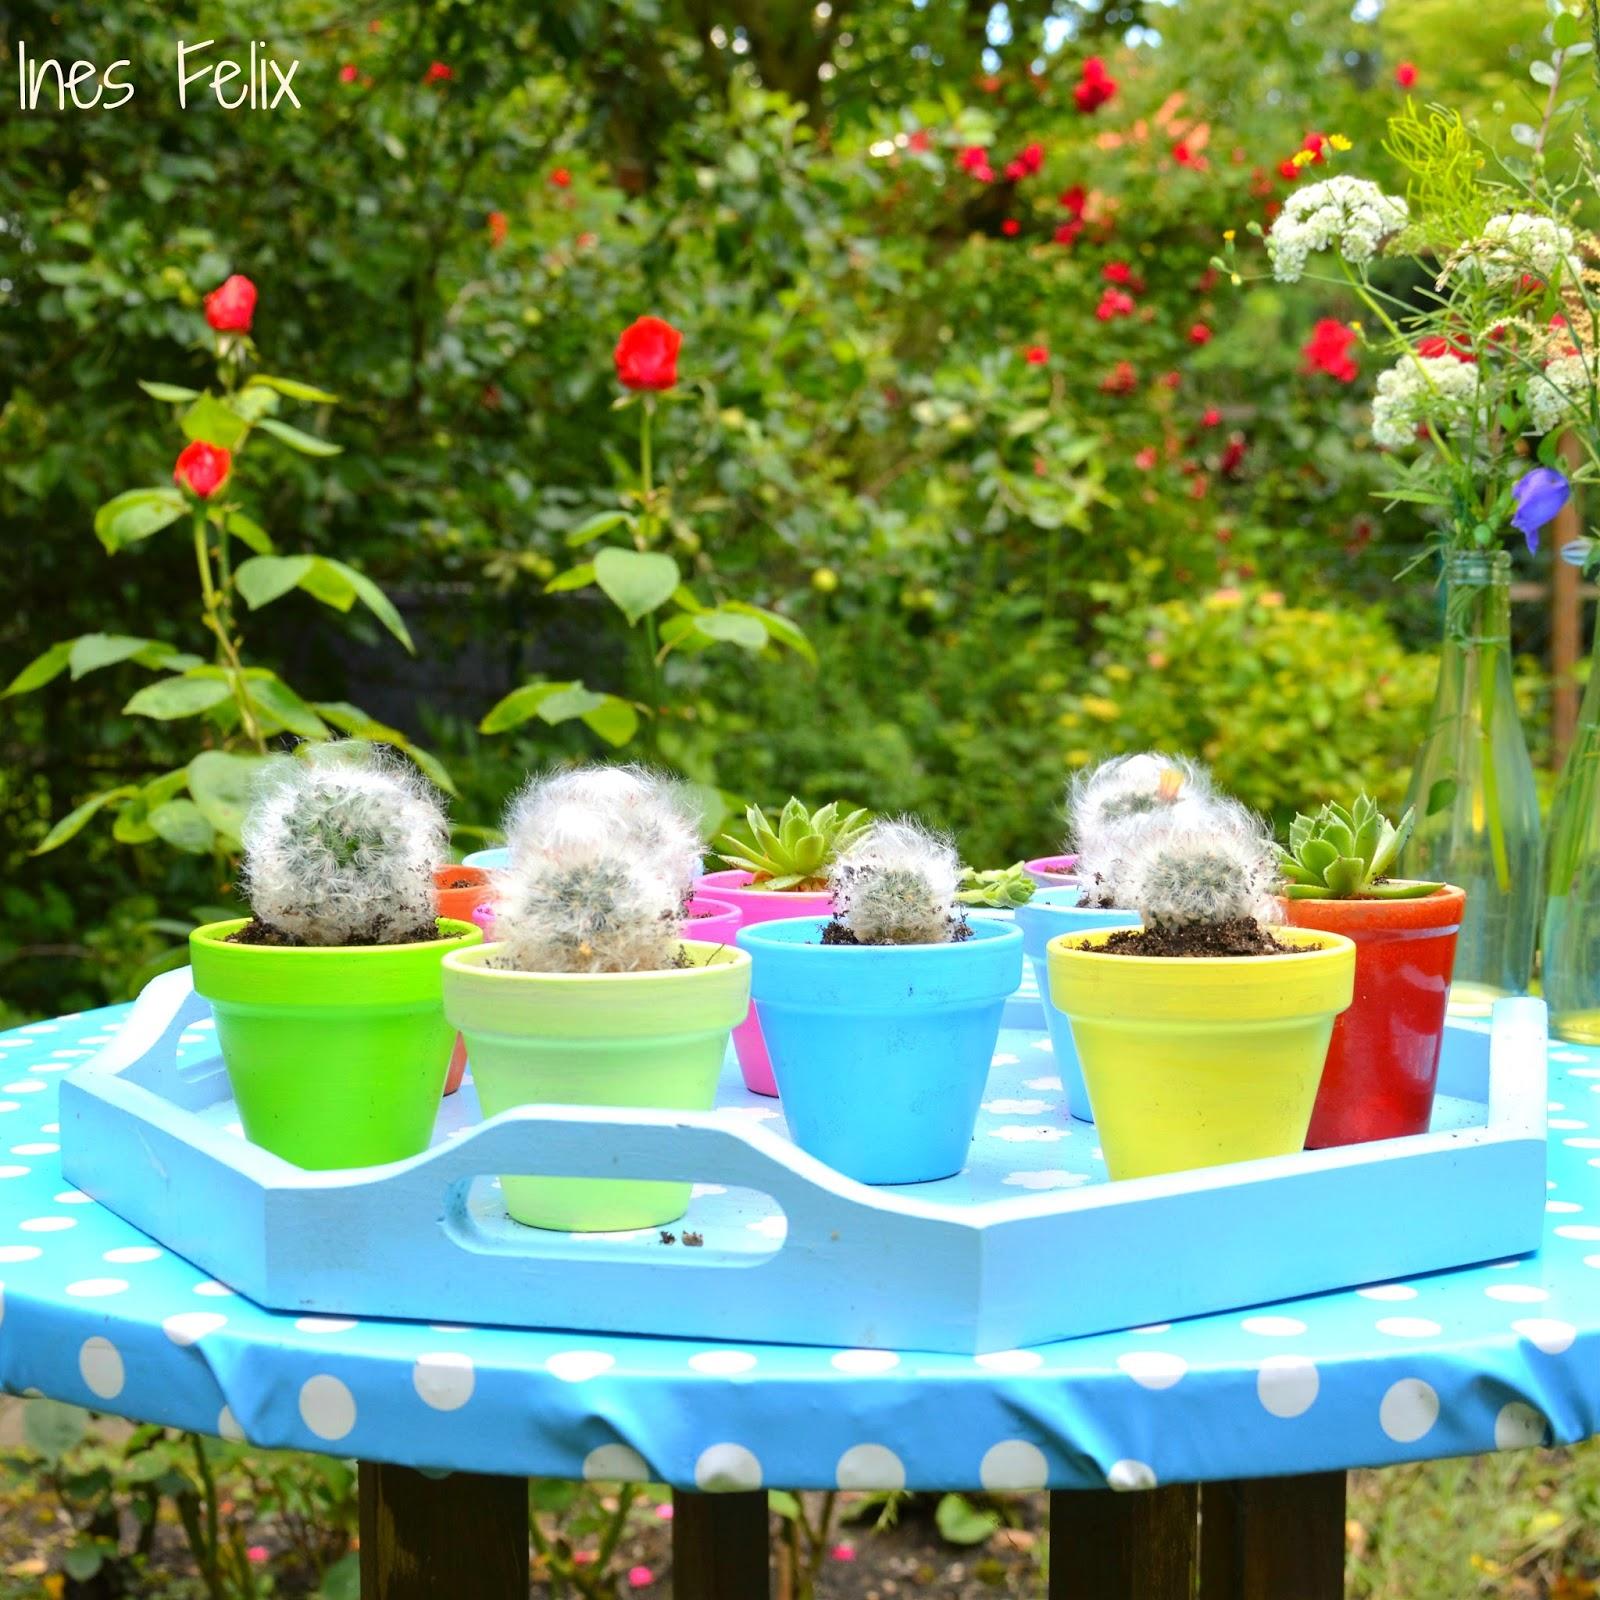 ines felix kreatives zum nachmachen mini gl cks kaktus. Black Bedroom Furniture Sets. Home Design Ideas